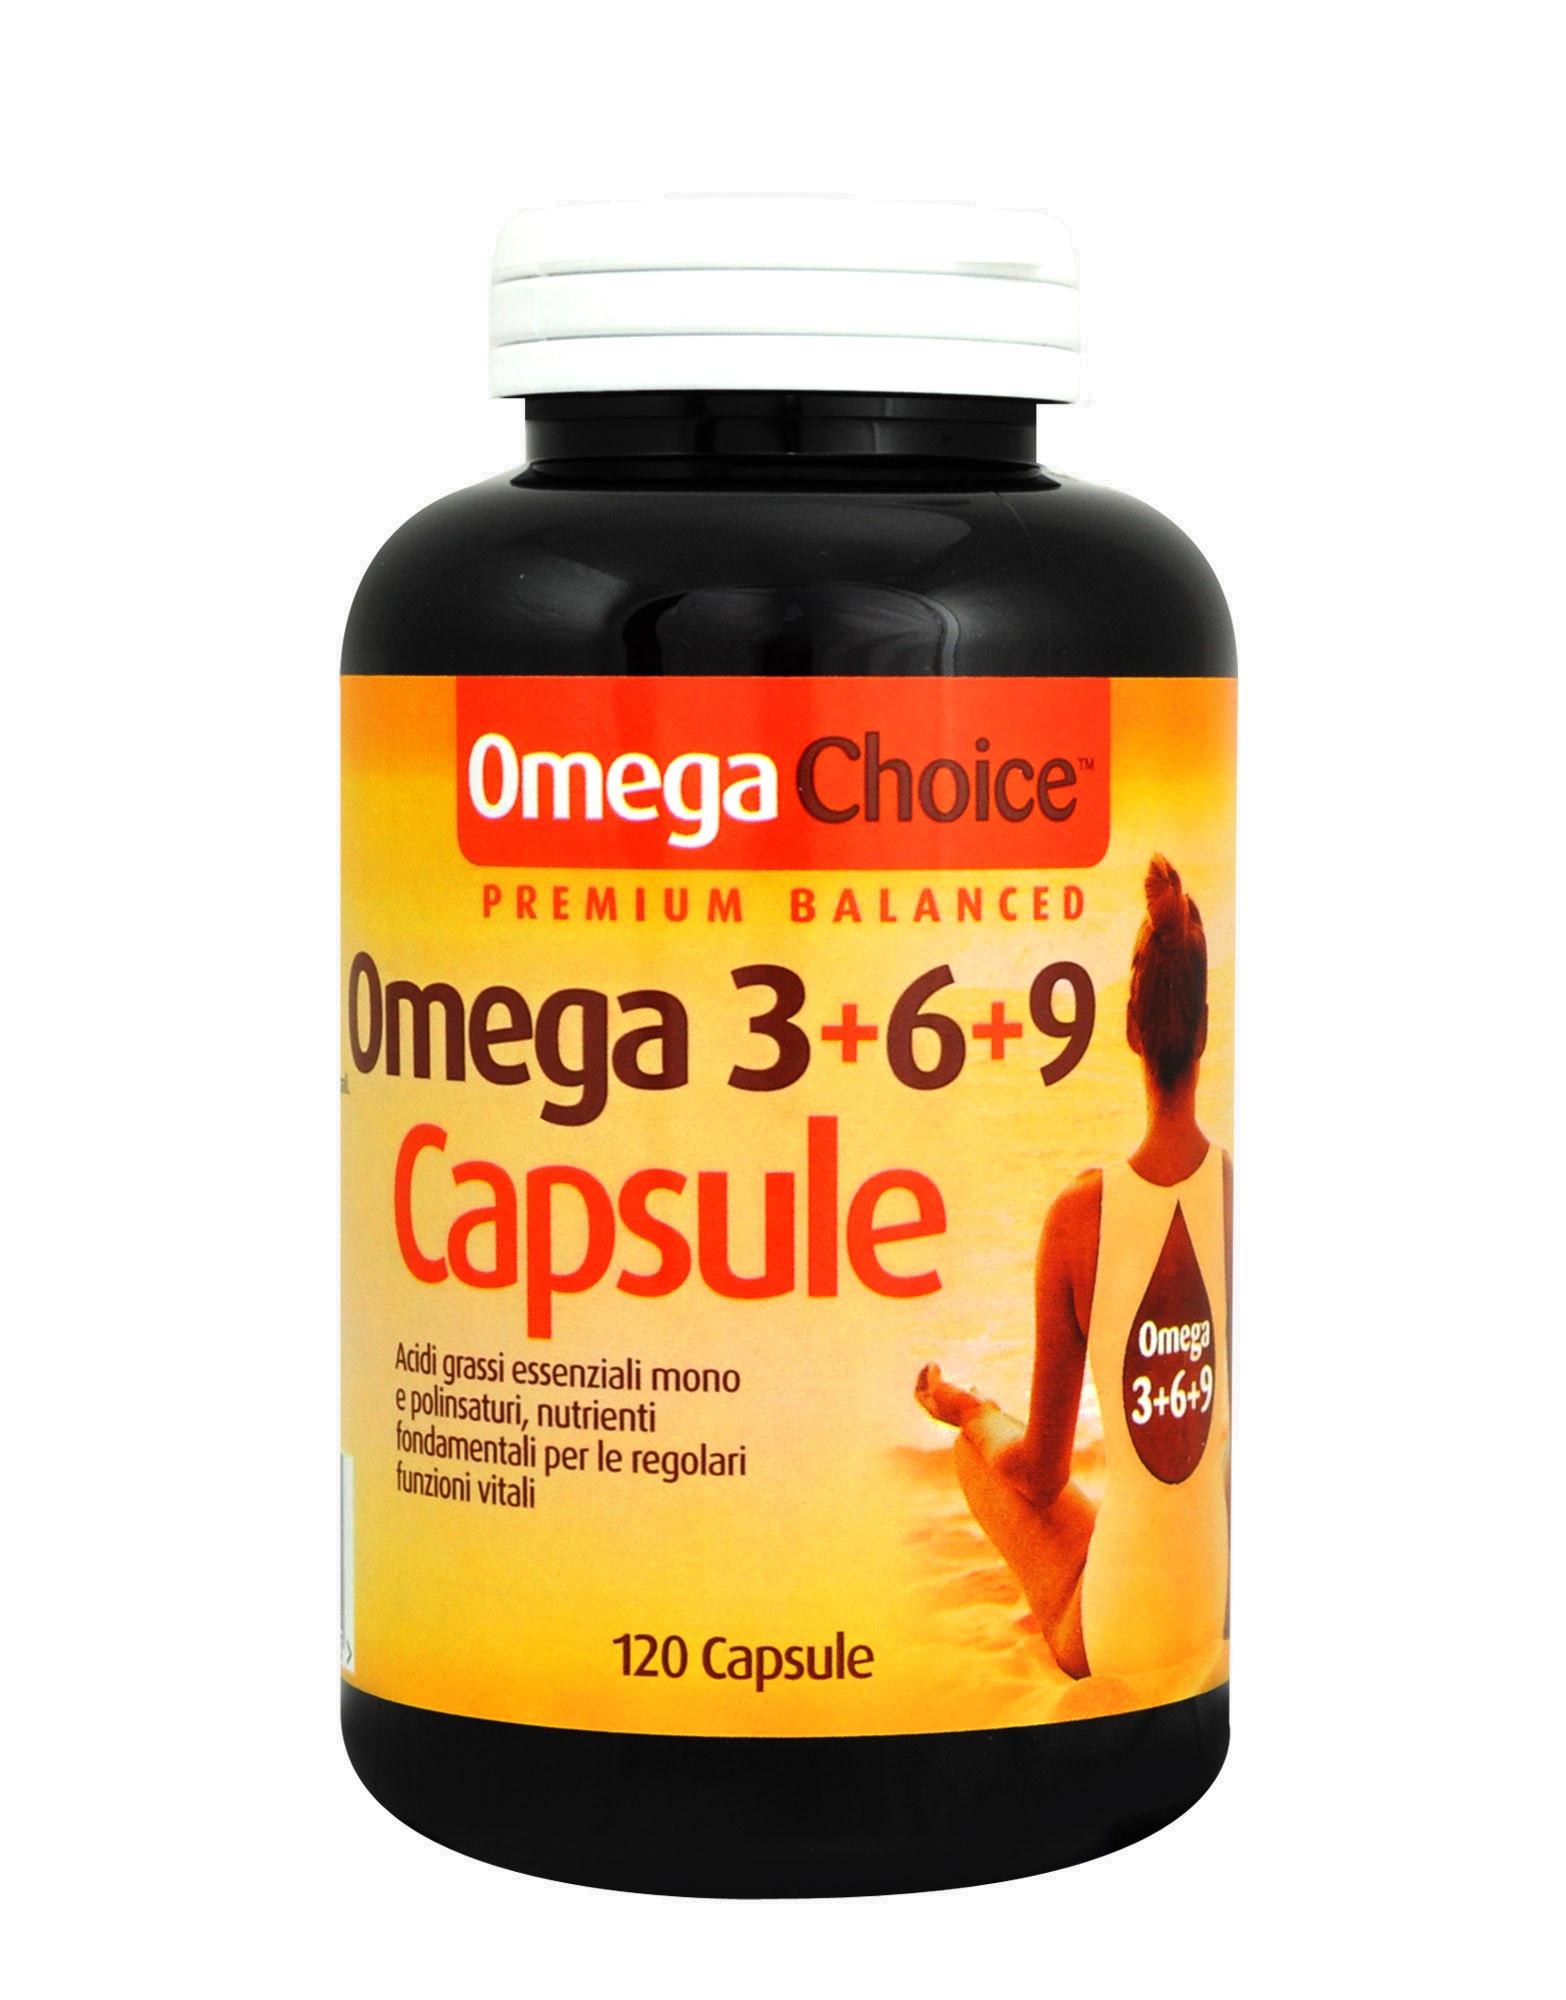 Omega Choice Omega 3 6 9 Capsules By Optima 120 Tablets